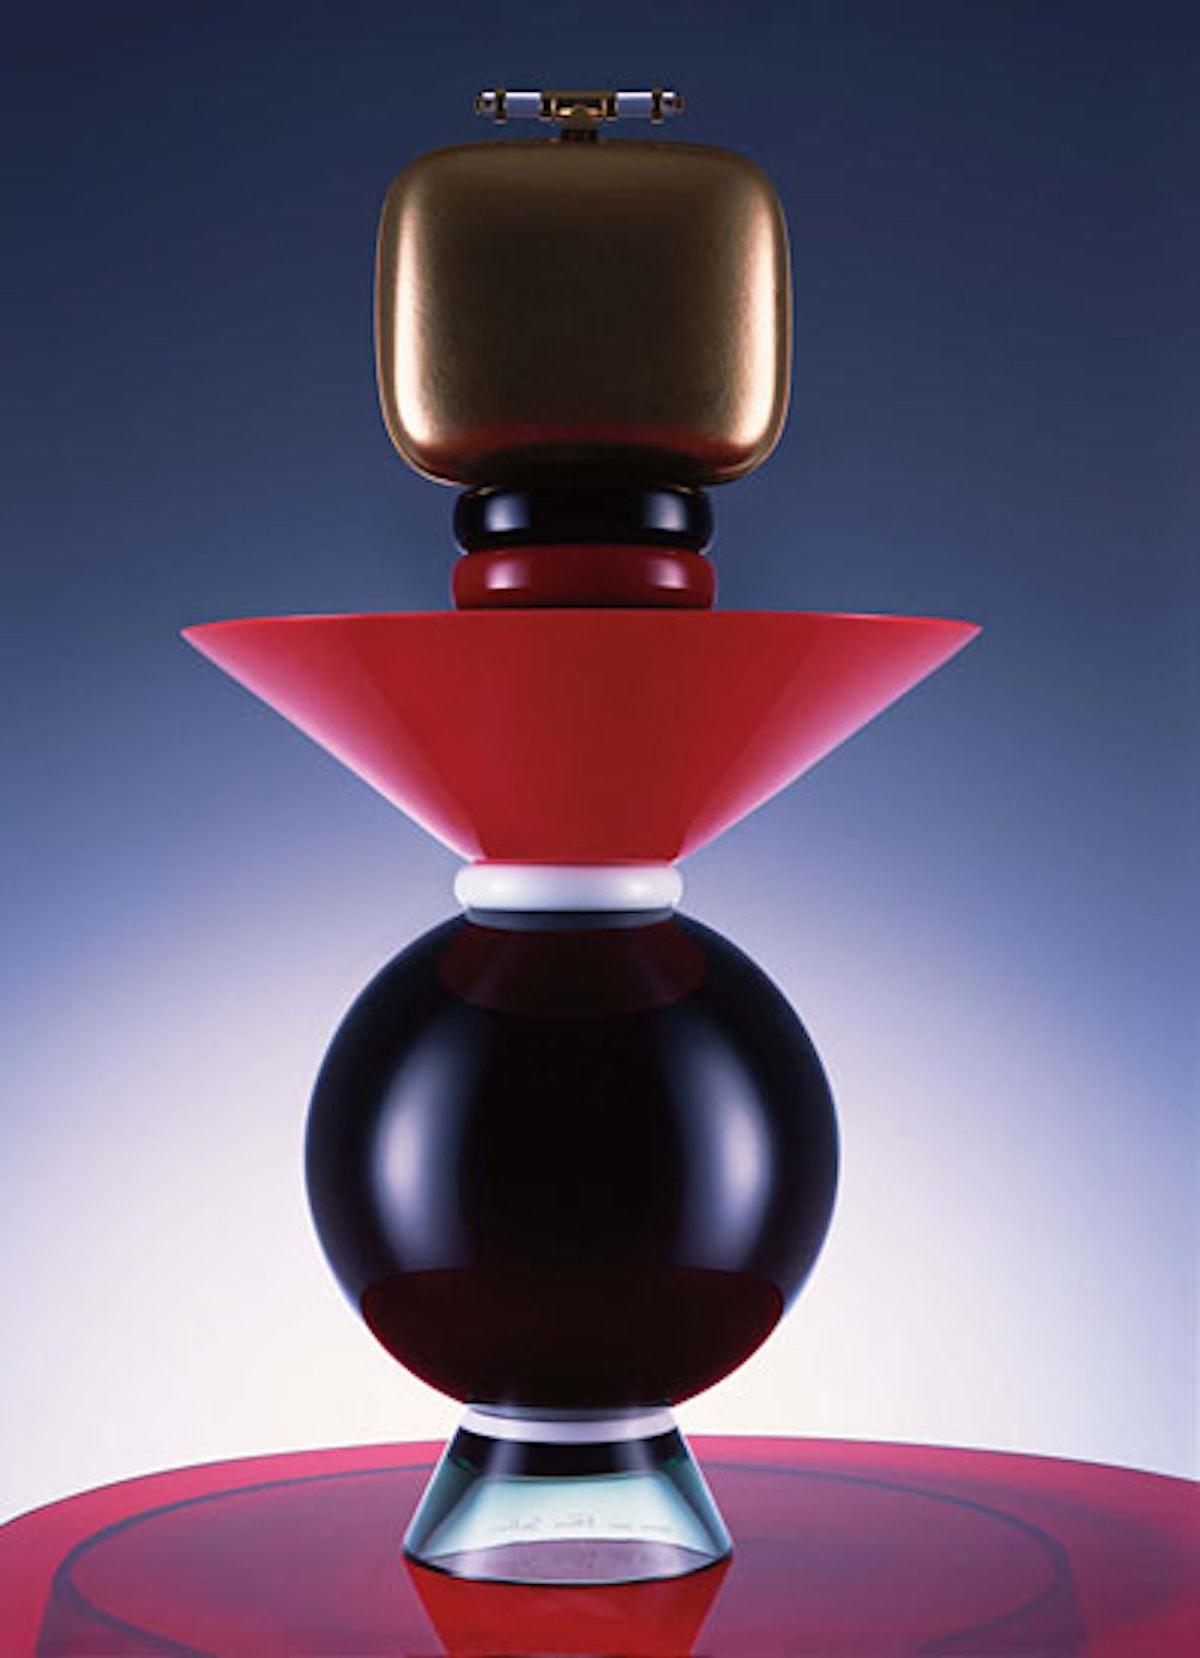 acss-sculptural-jewels-01-v.jpg